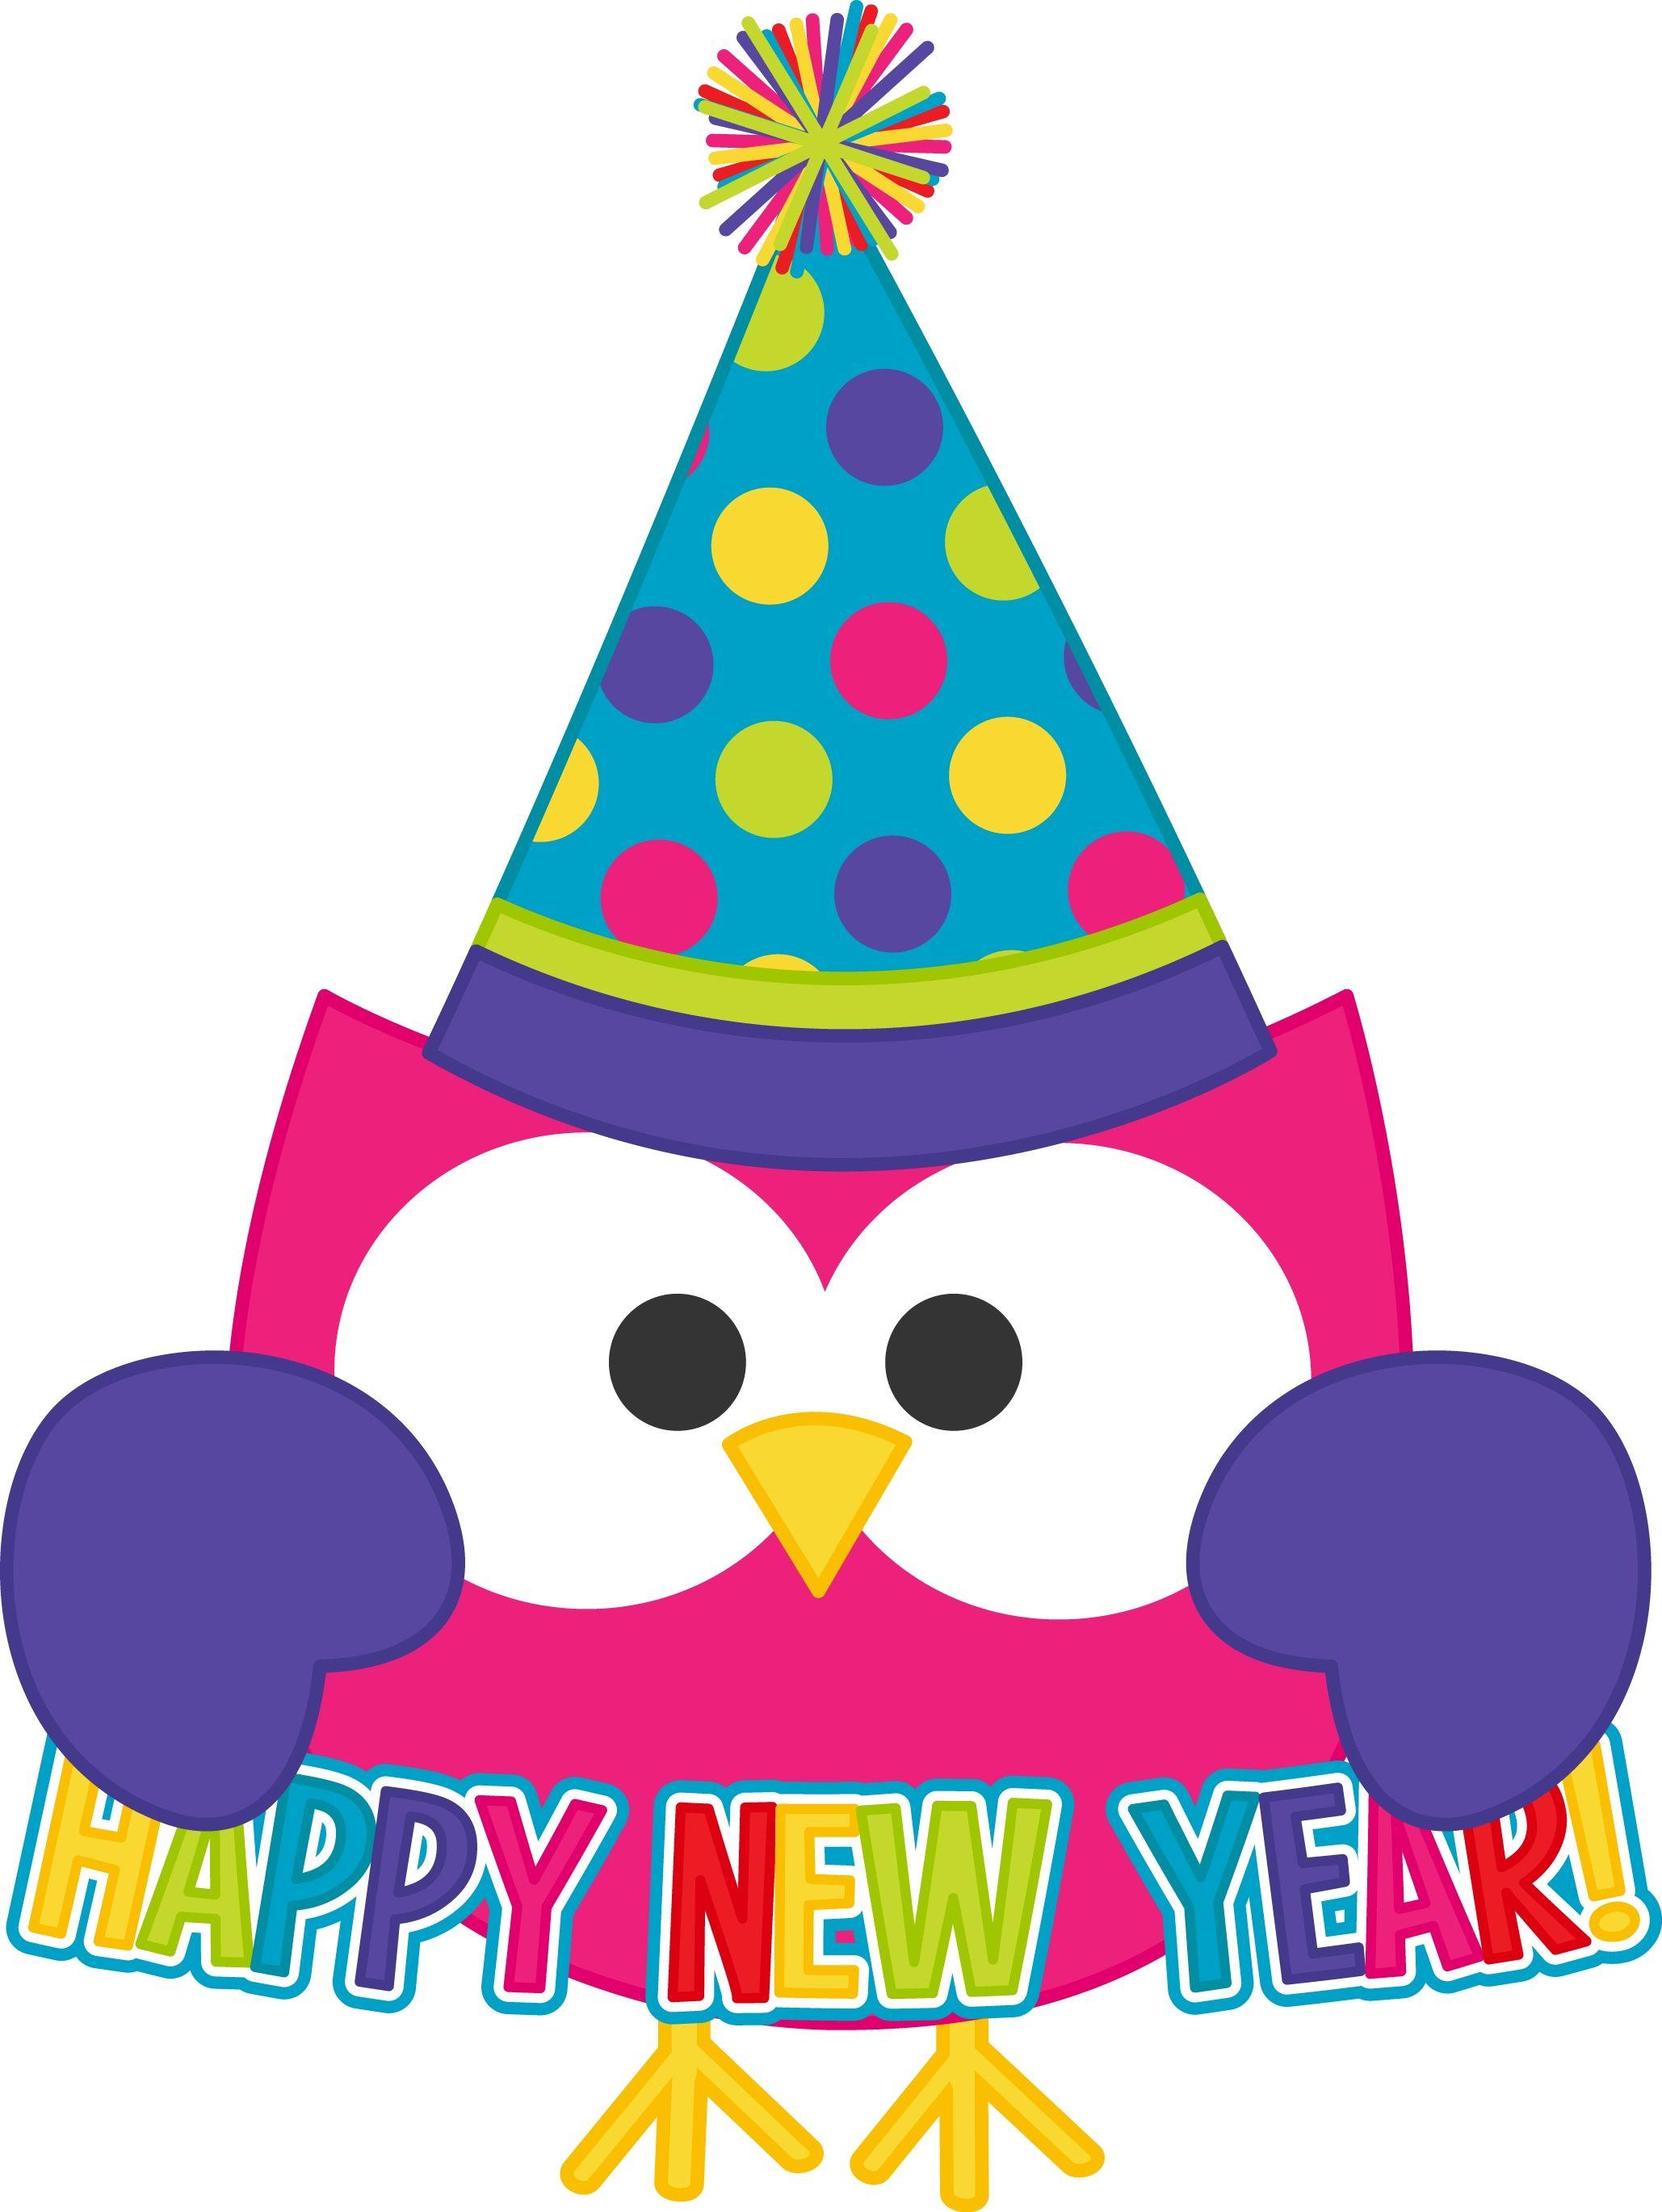 Happy New Year Clip Art happy_new_year_clip_art_hd